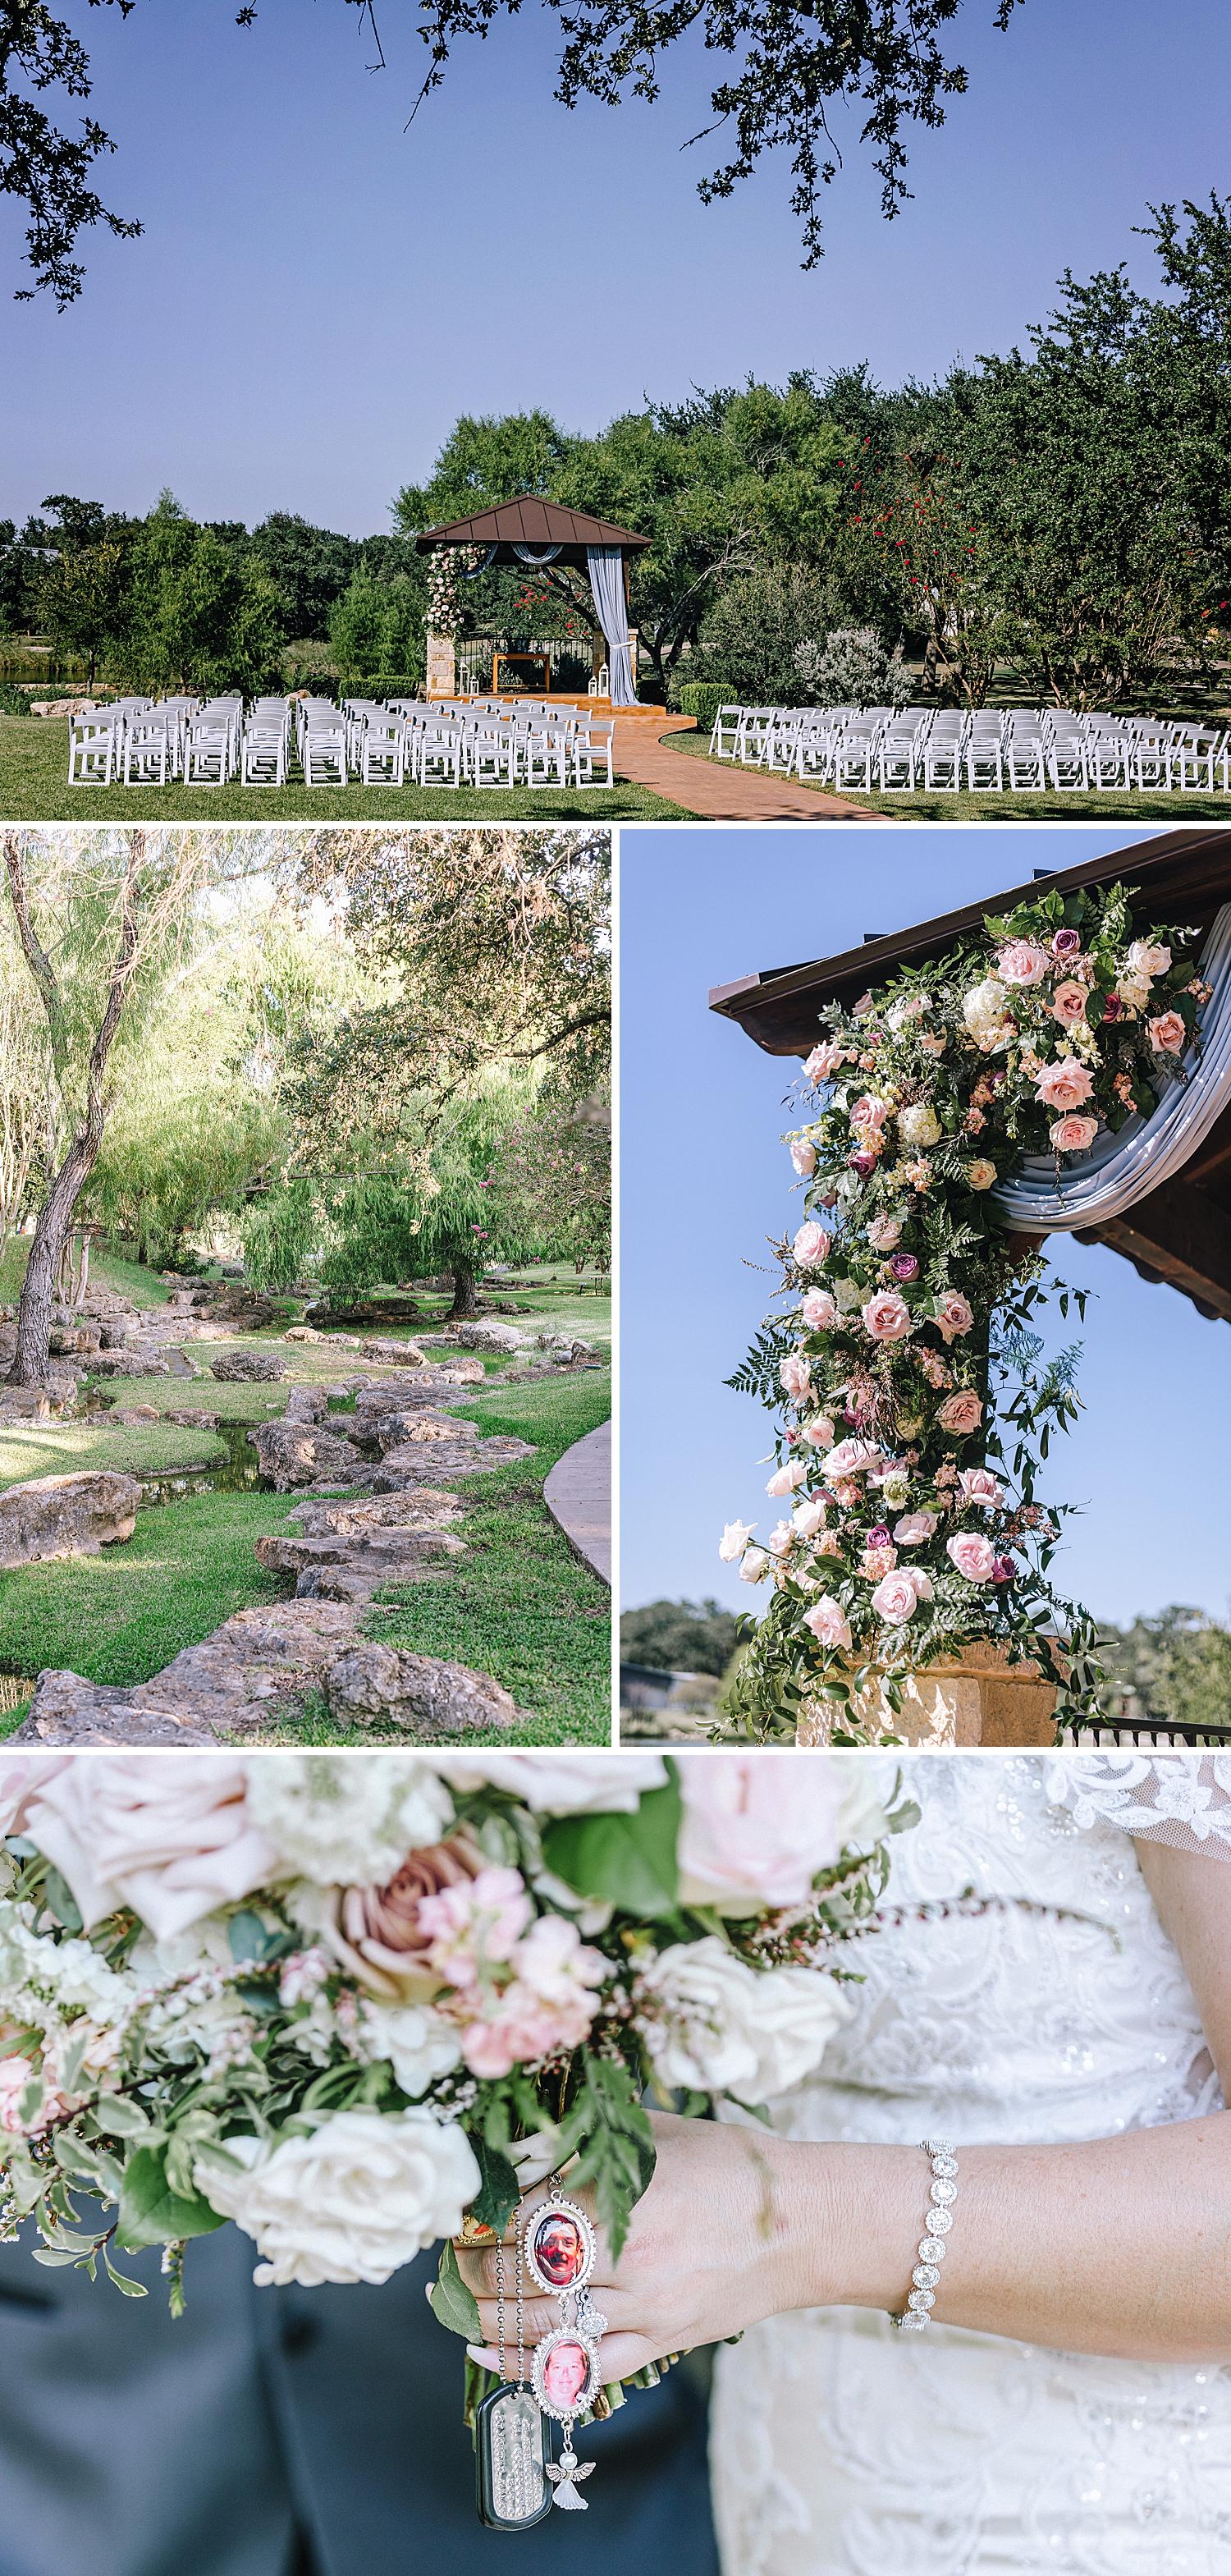 The-Club-at-Garden-Ridge-Military-Wedding-Carly-Barton-Photography_0035.jpg